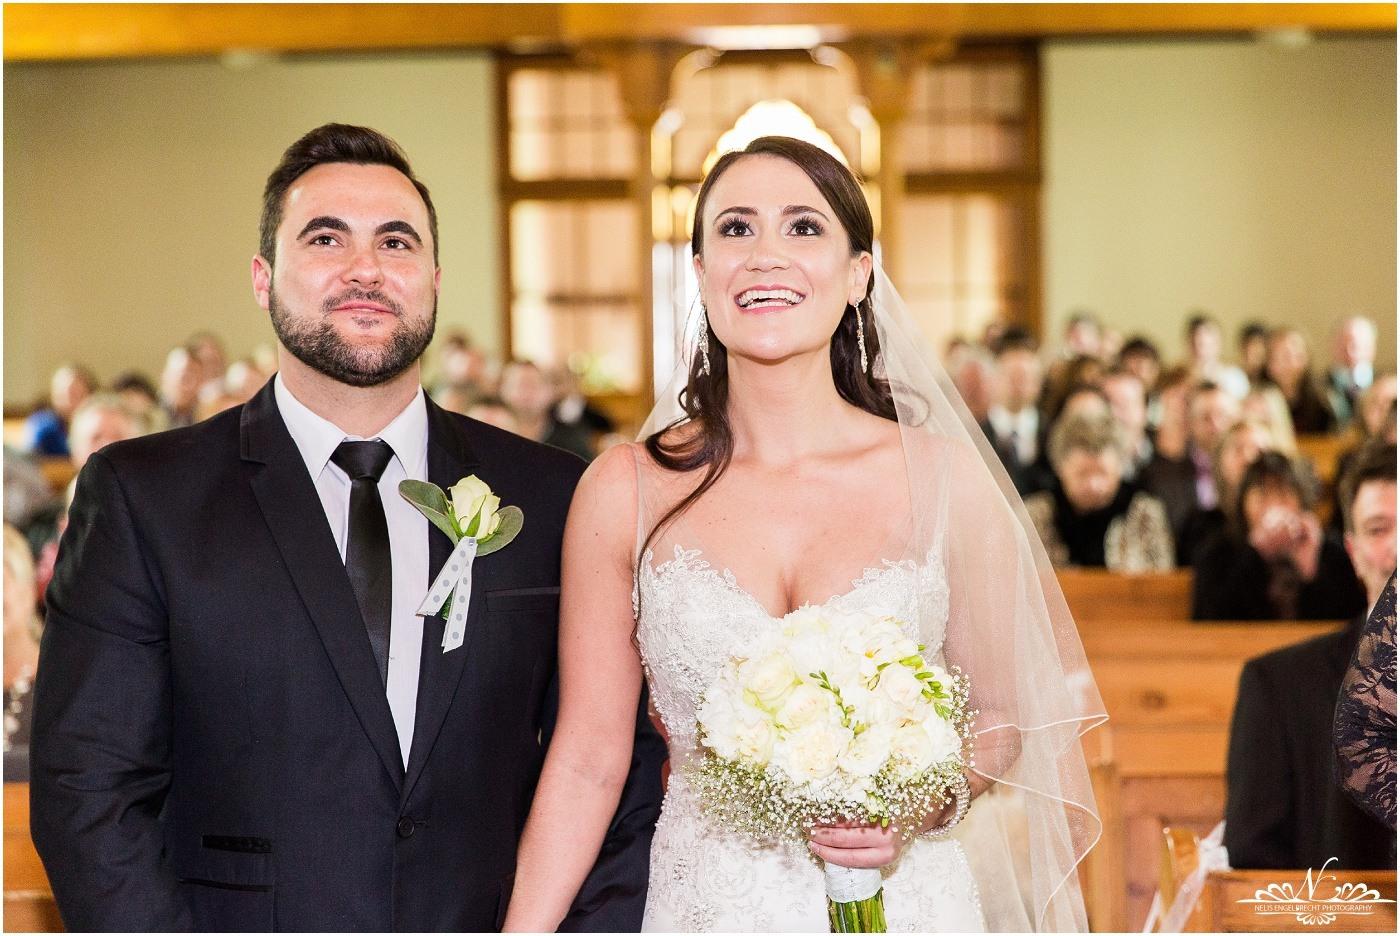 Eensgezind-Wedding-Photos-Nelis-Engelbrecht-Photography-061